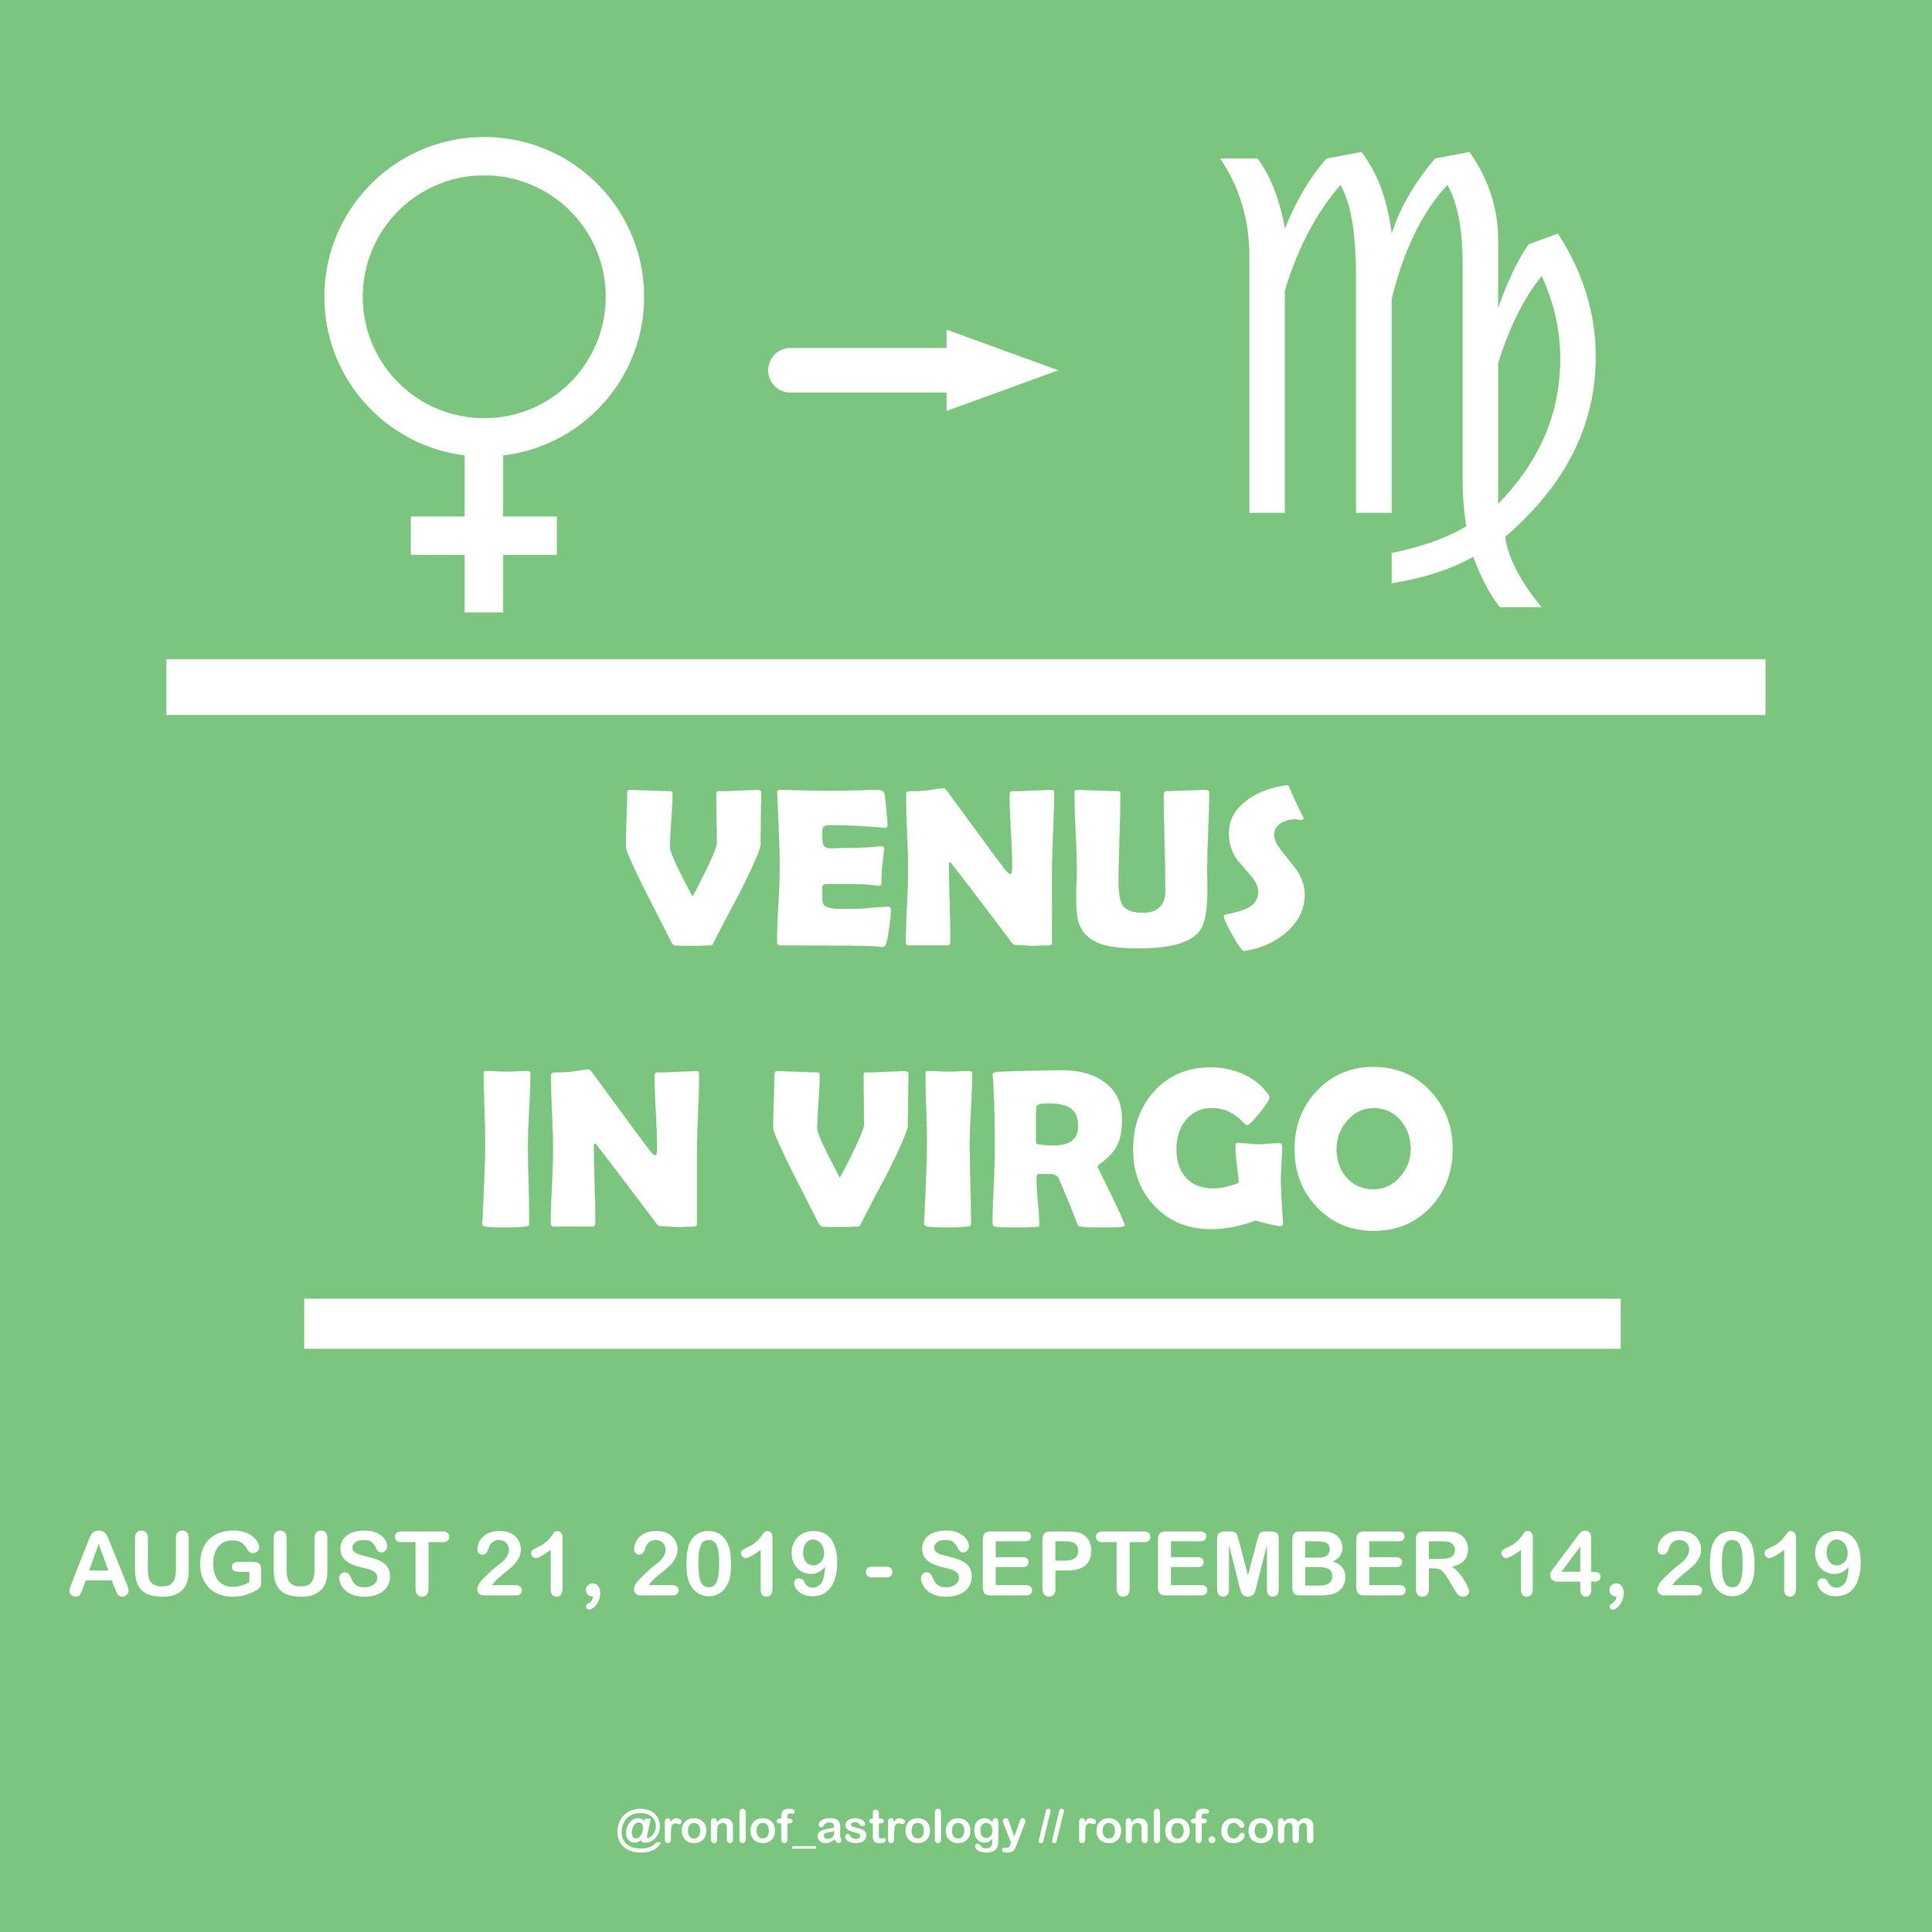 VenusVirgo.jpg